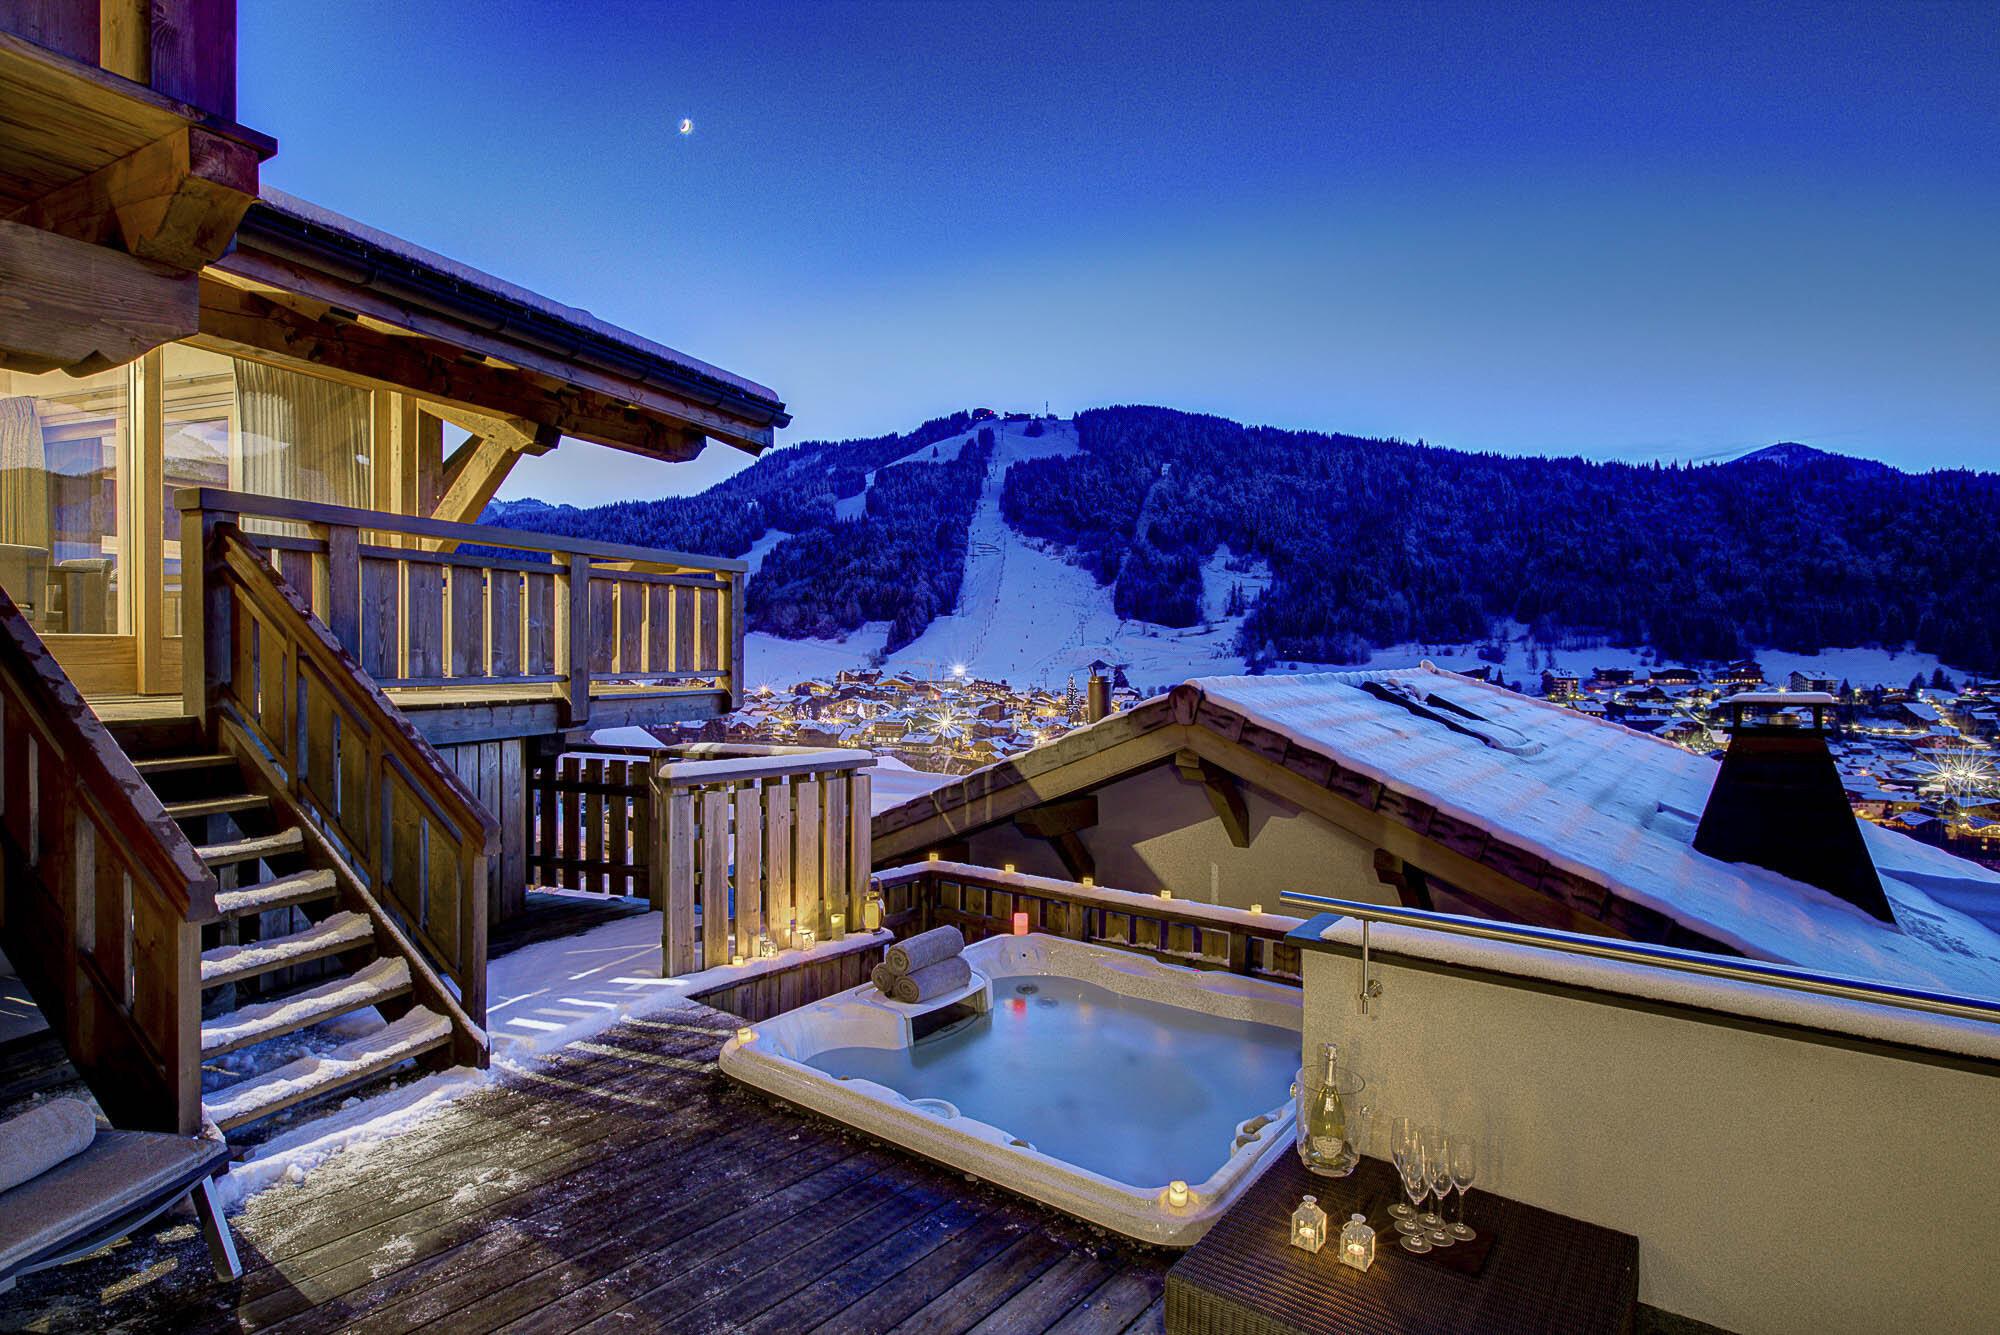 tg-ski-luxury-chalet-bouquetin-morzine-hot-tub-020.jpg